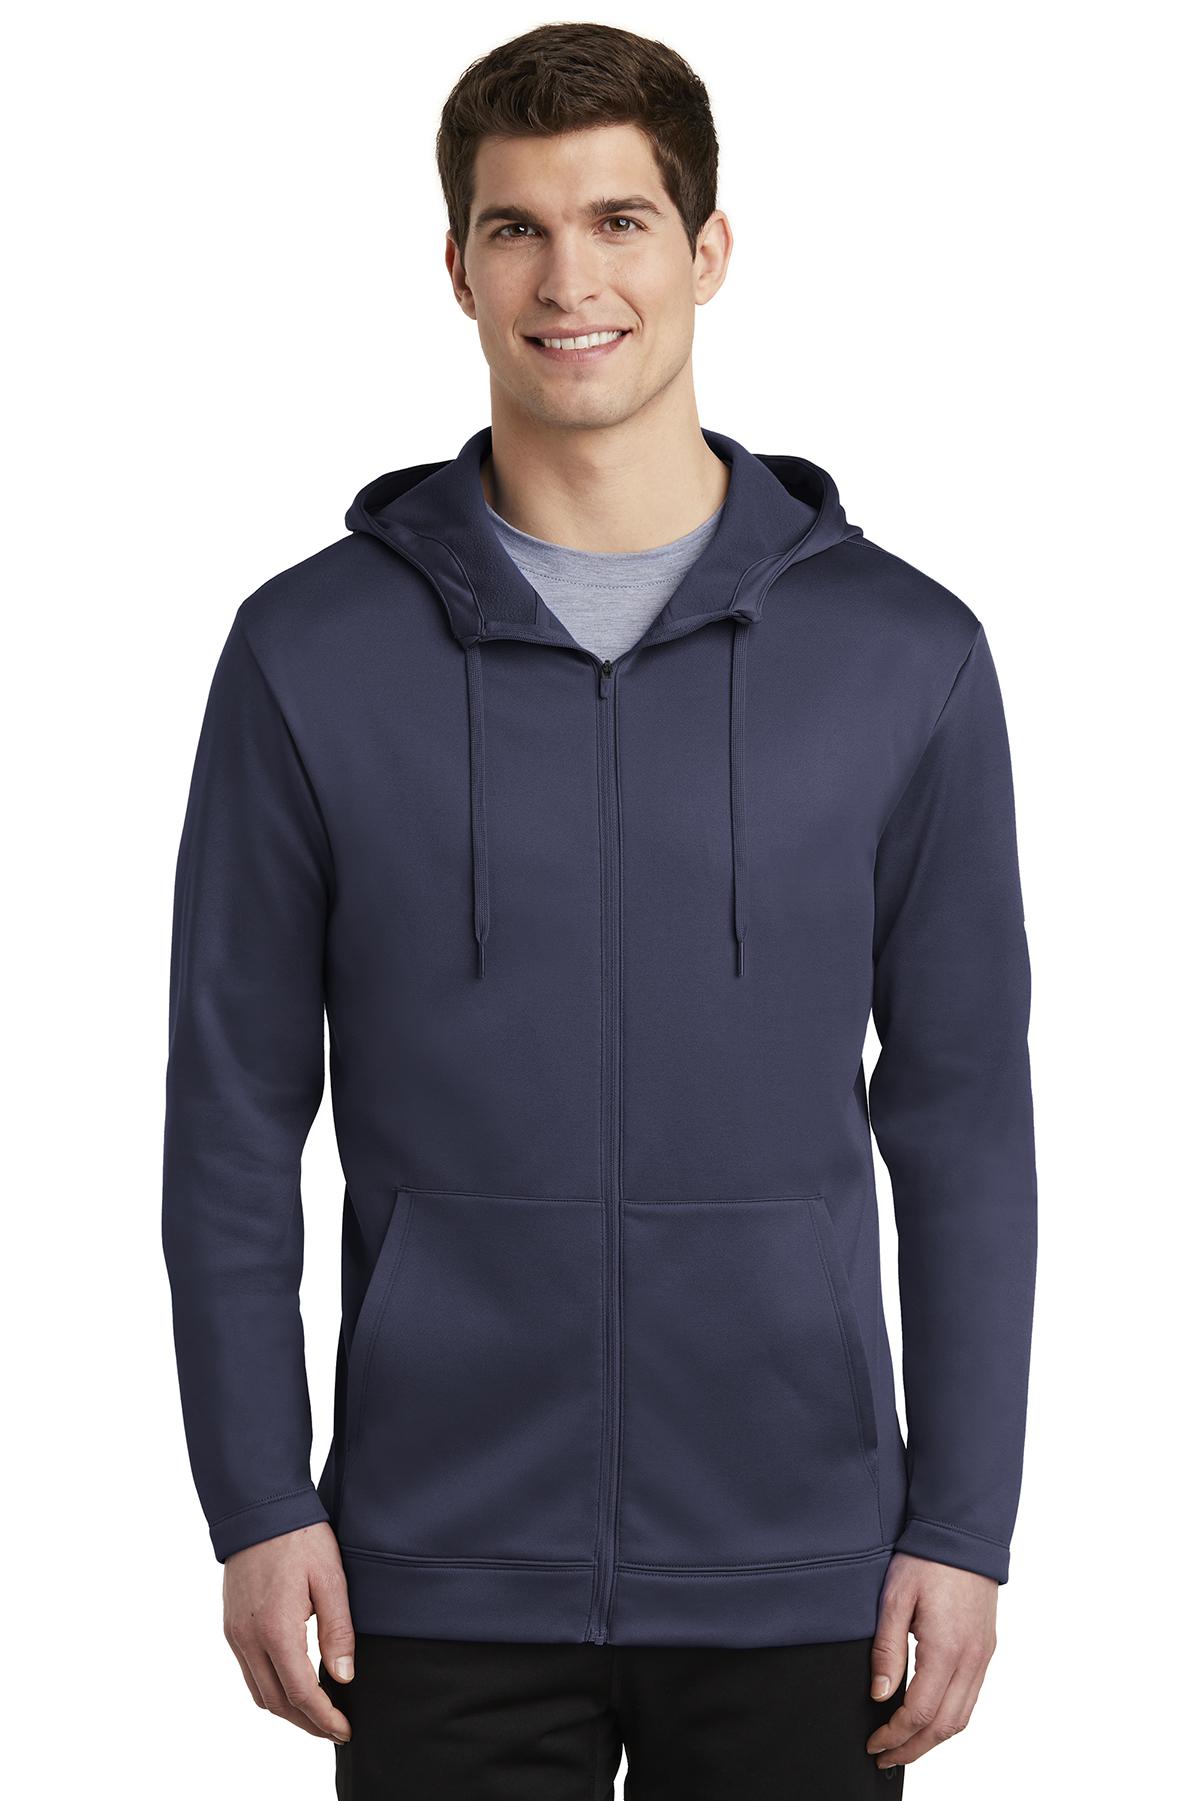 9b48a5a1ce0c Nike Therma-FIT Full-Zip Fleece Hoodie